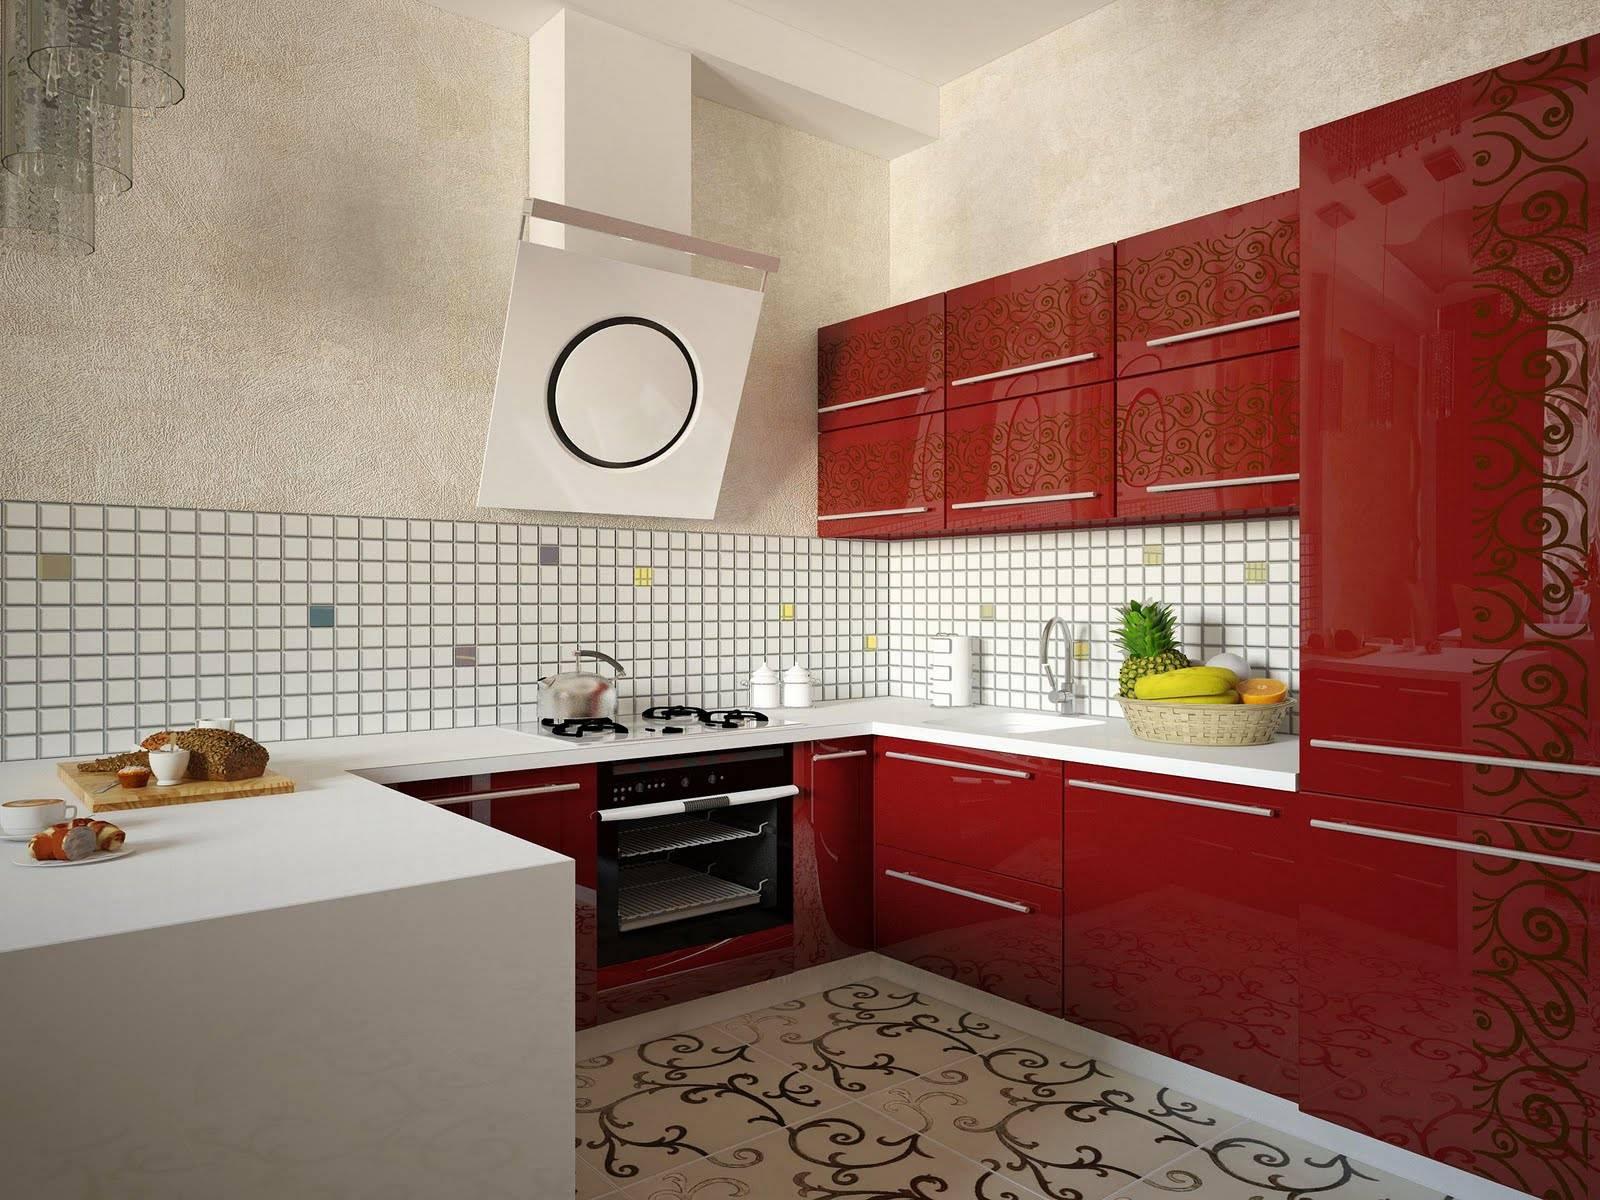 Красно-белая кухня с узорами